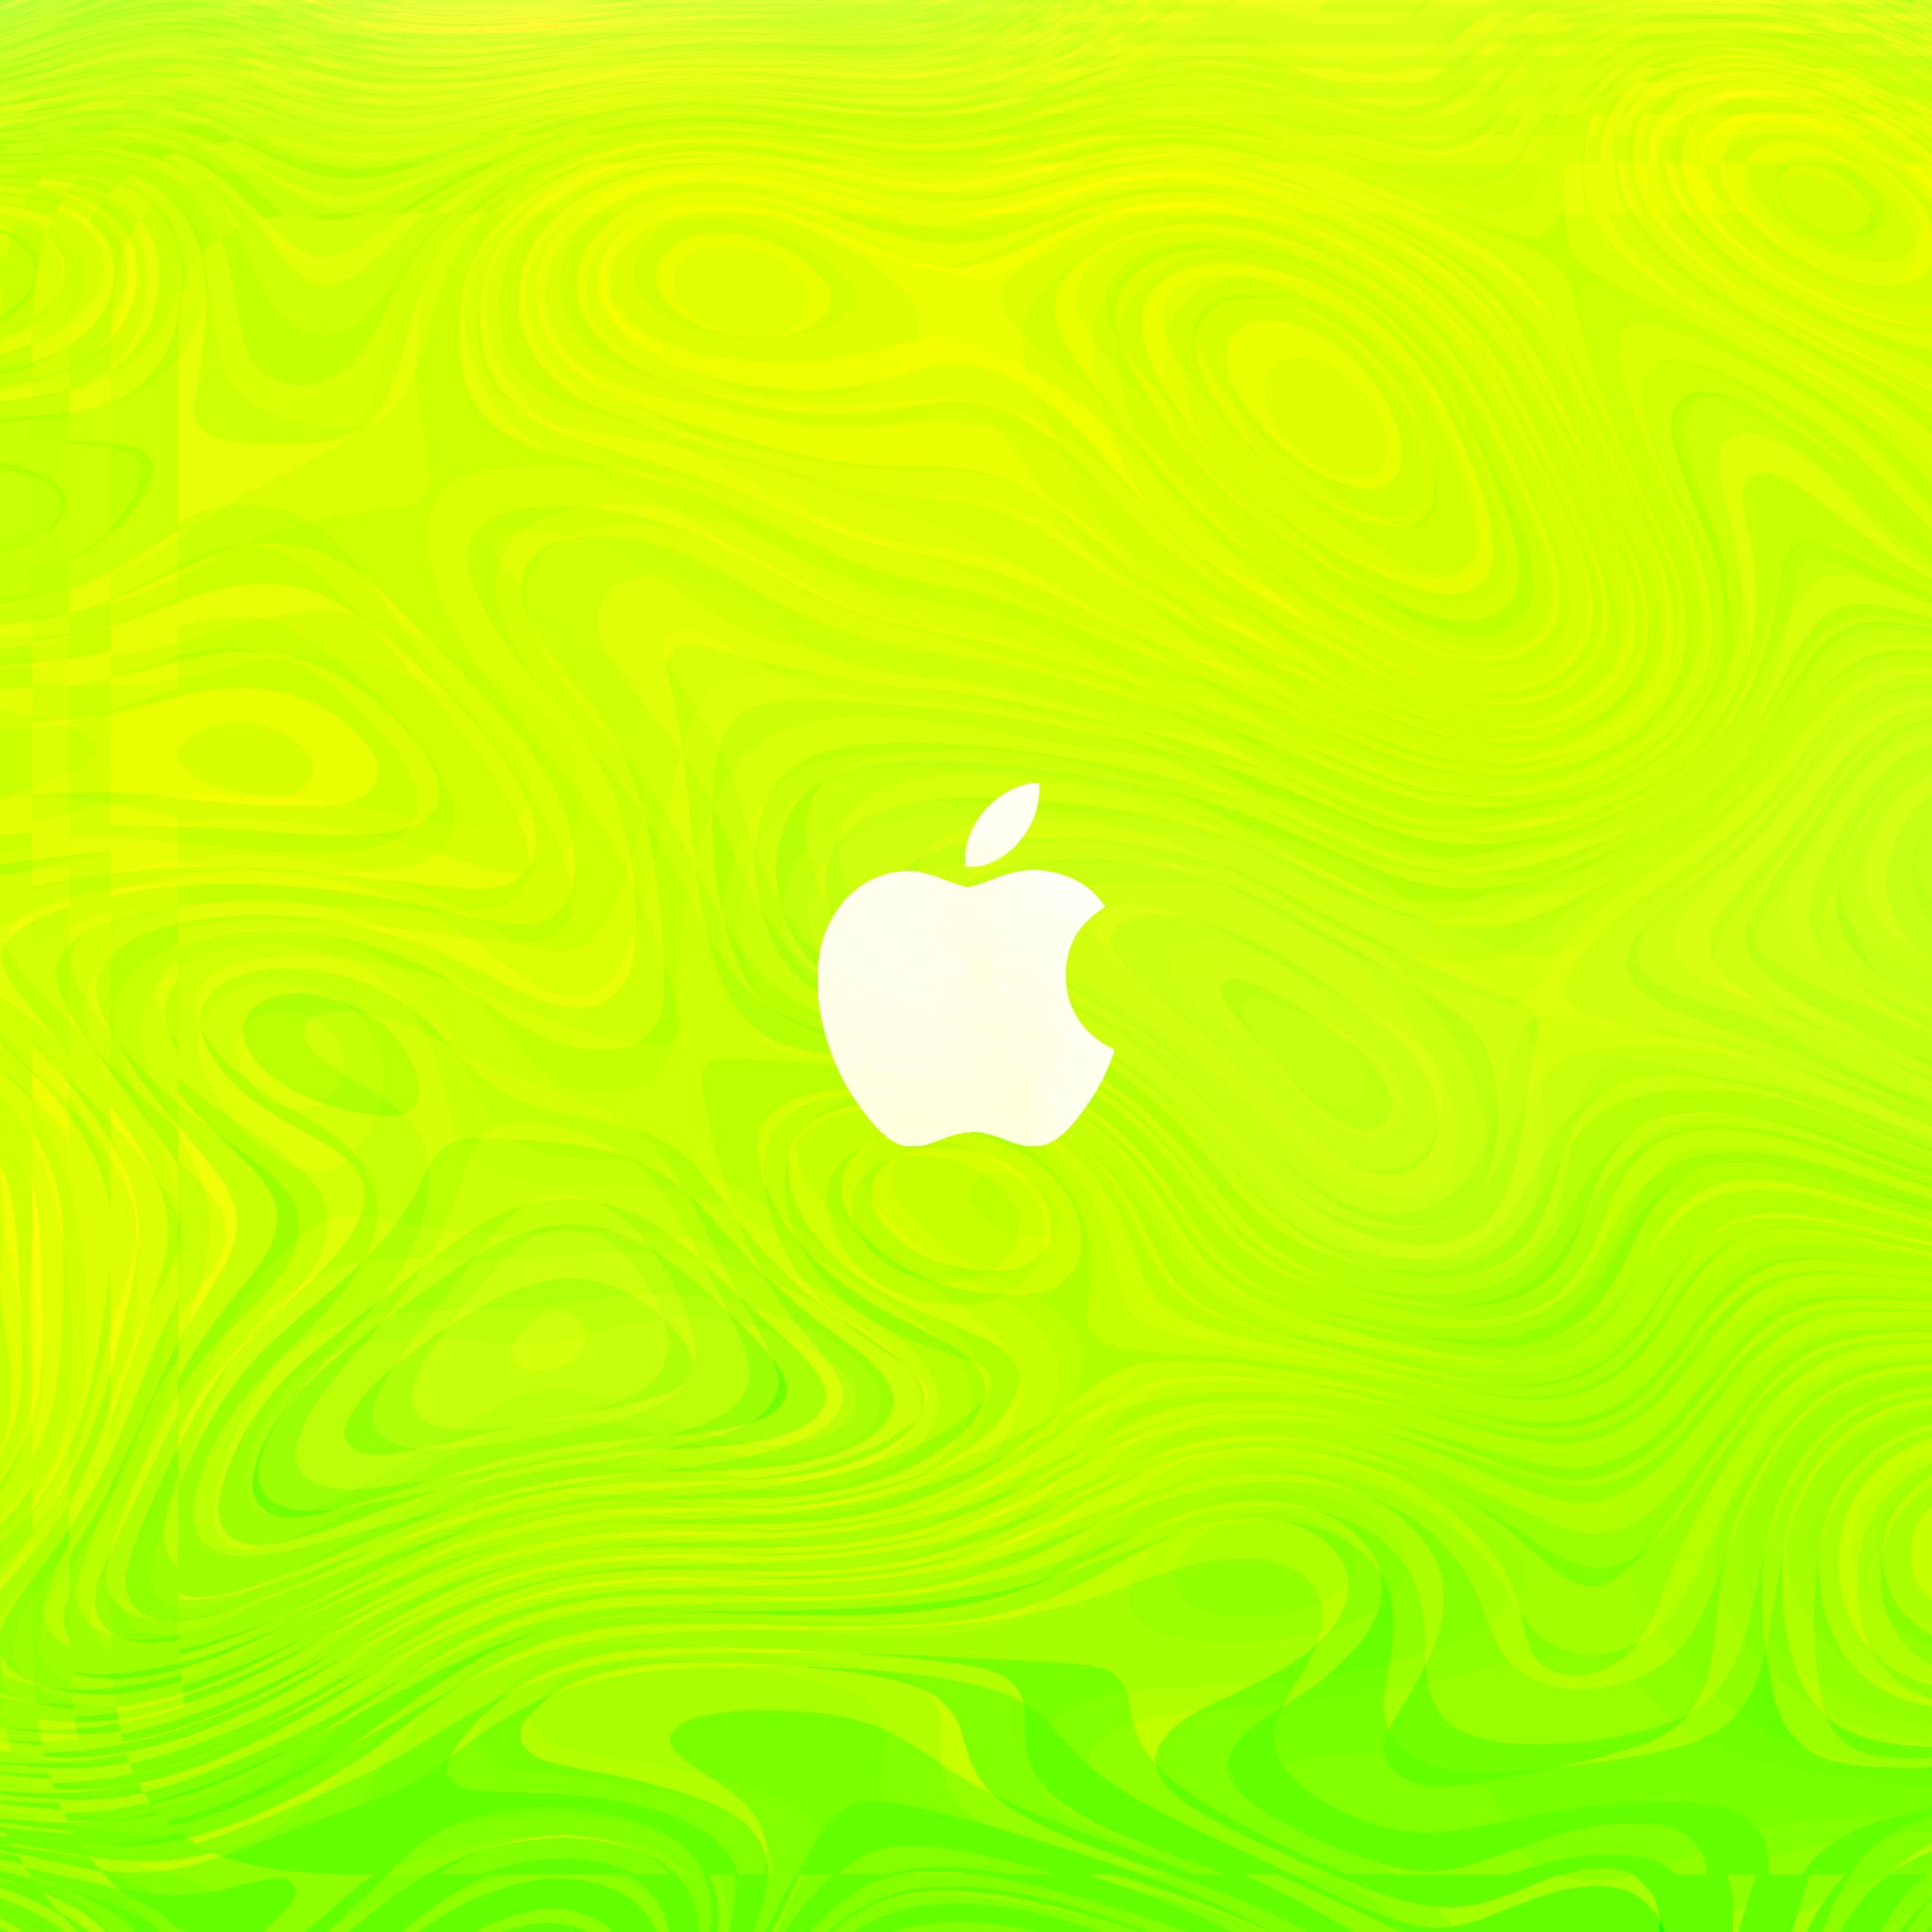 gallery apple filename ipad retina wallpaper apple logo hd 52 jpg 2048x2048